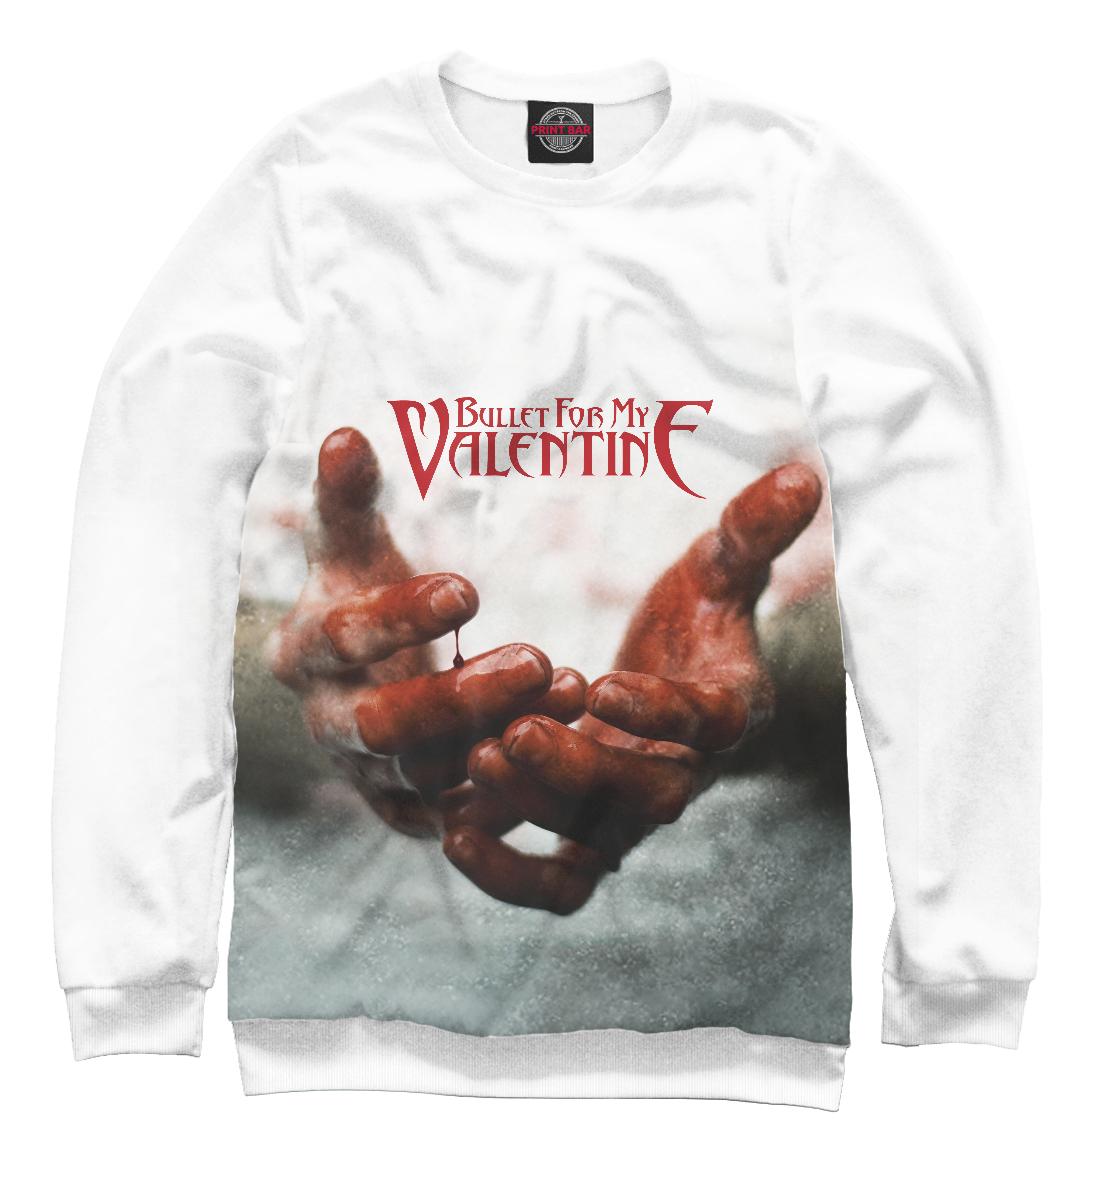 Купить Bullet for My Valentine, Printbar, Свитшоты, MZK-310444-swi-2